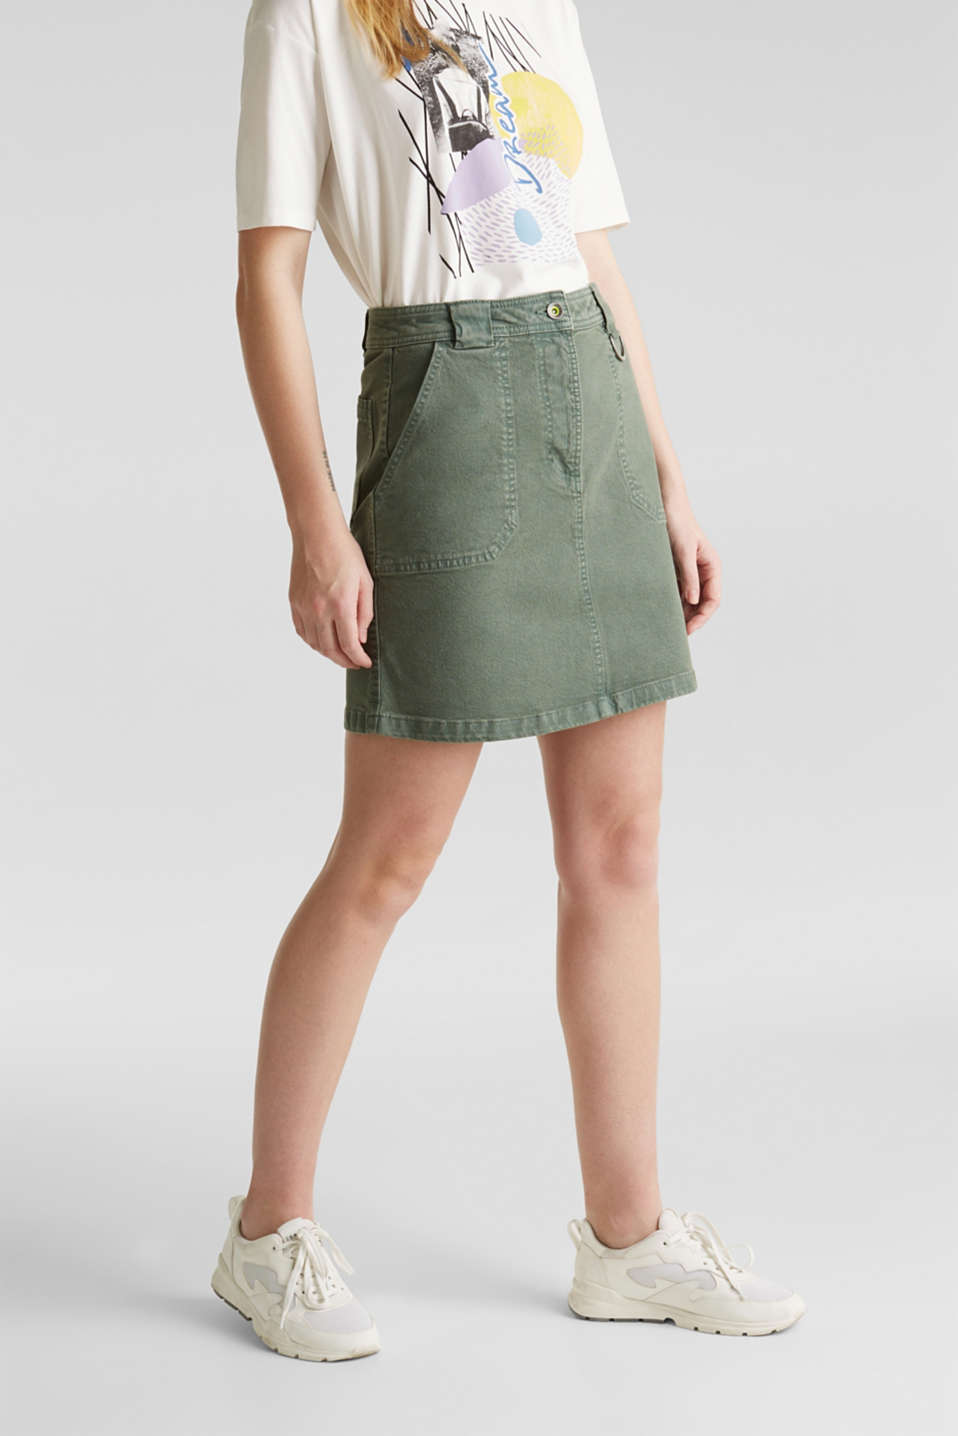 Denim skirt with pockets, KHAKI GREEN, detail image number 6